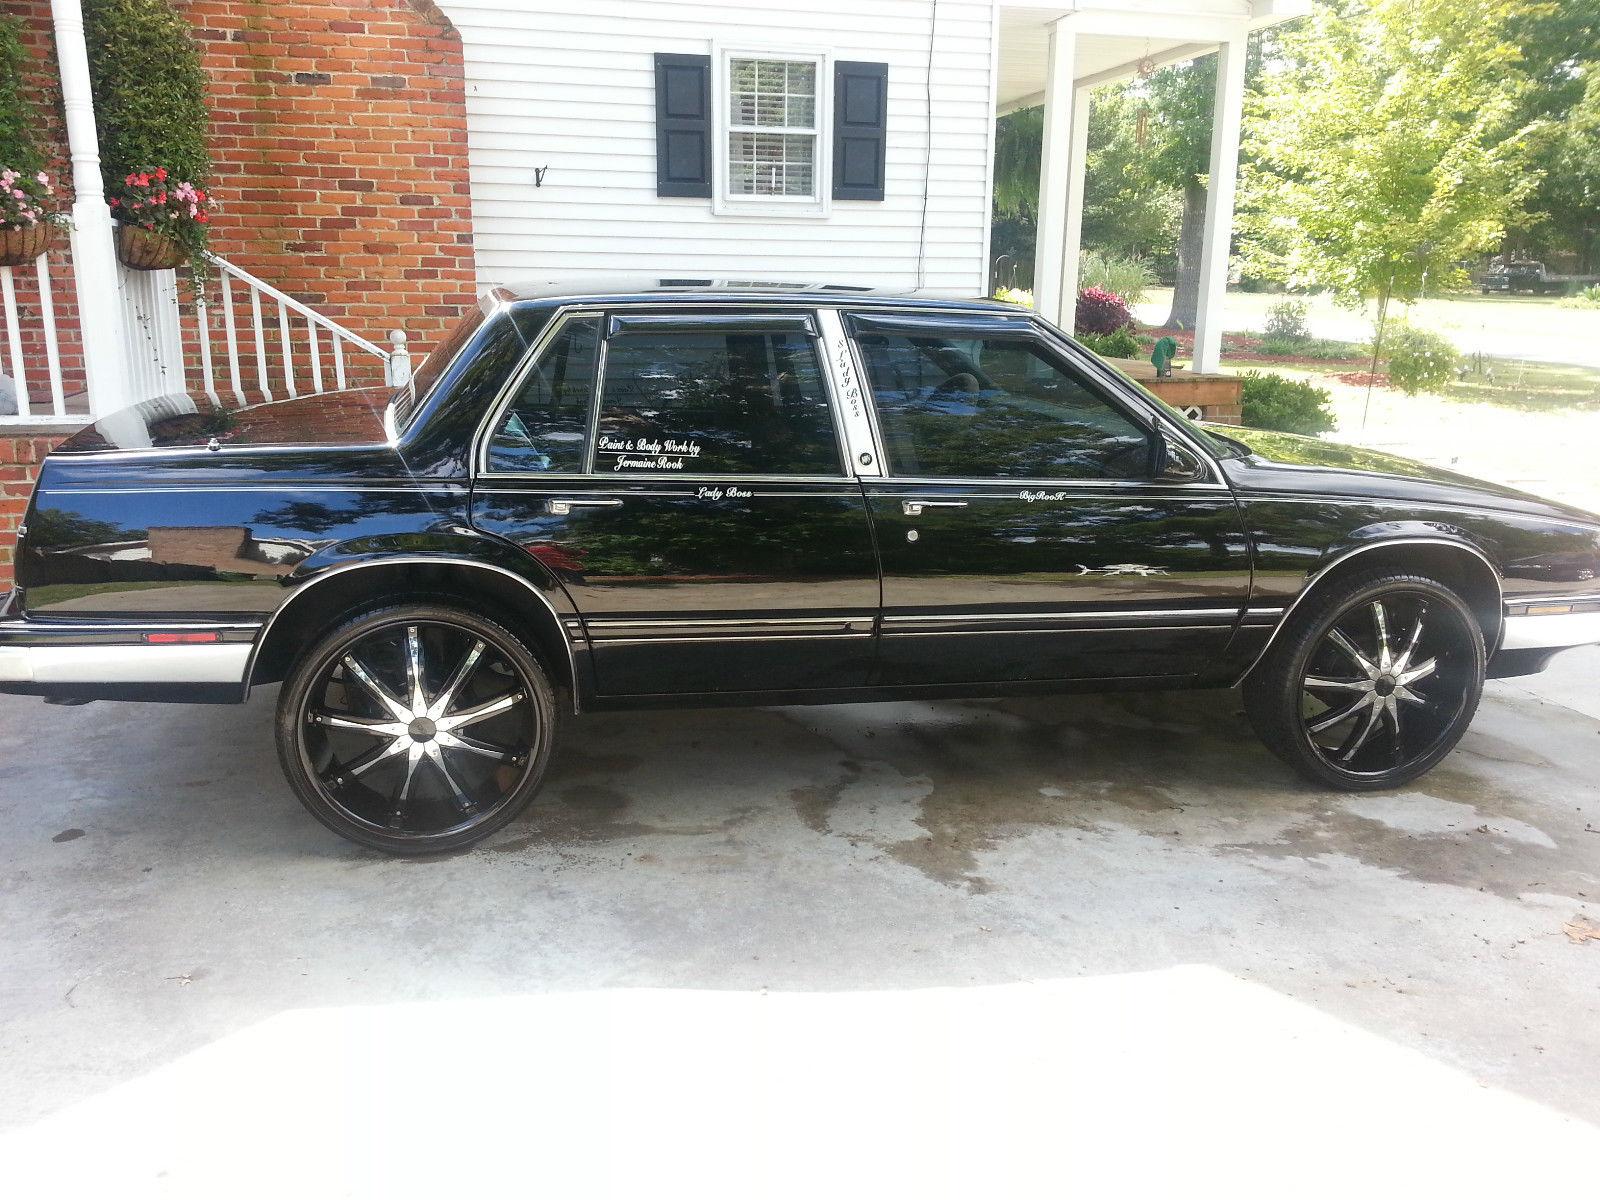 Buick Lesabre Custom Painted Black Black Wheels Low Miles on 1989 Buick Lesabre Le